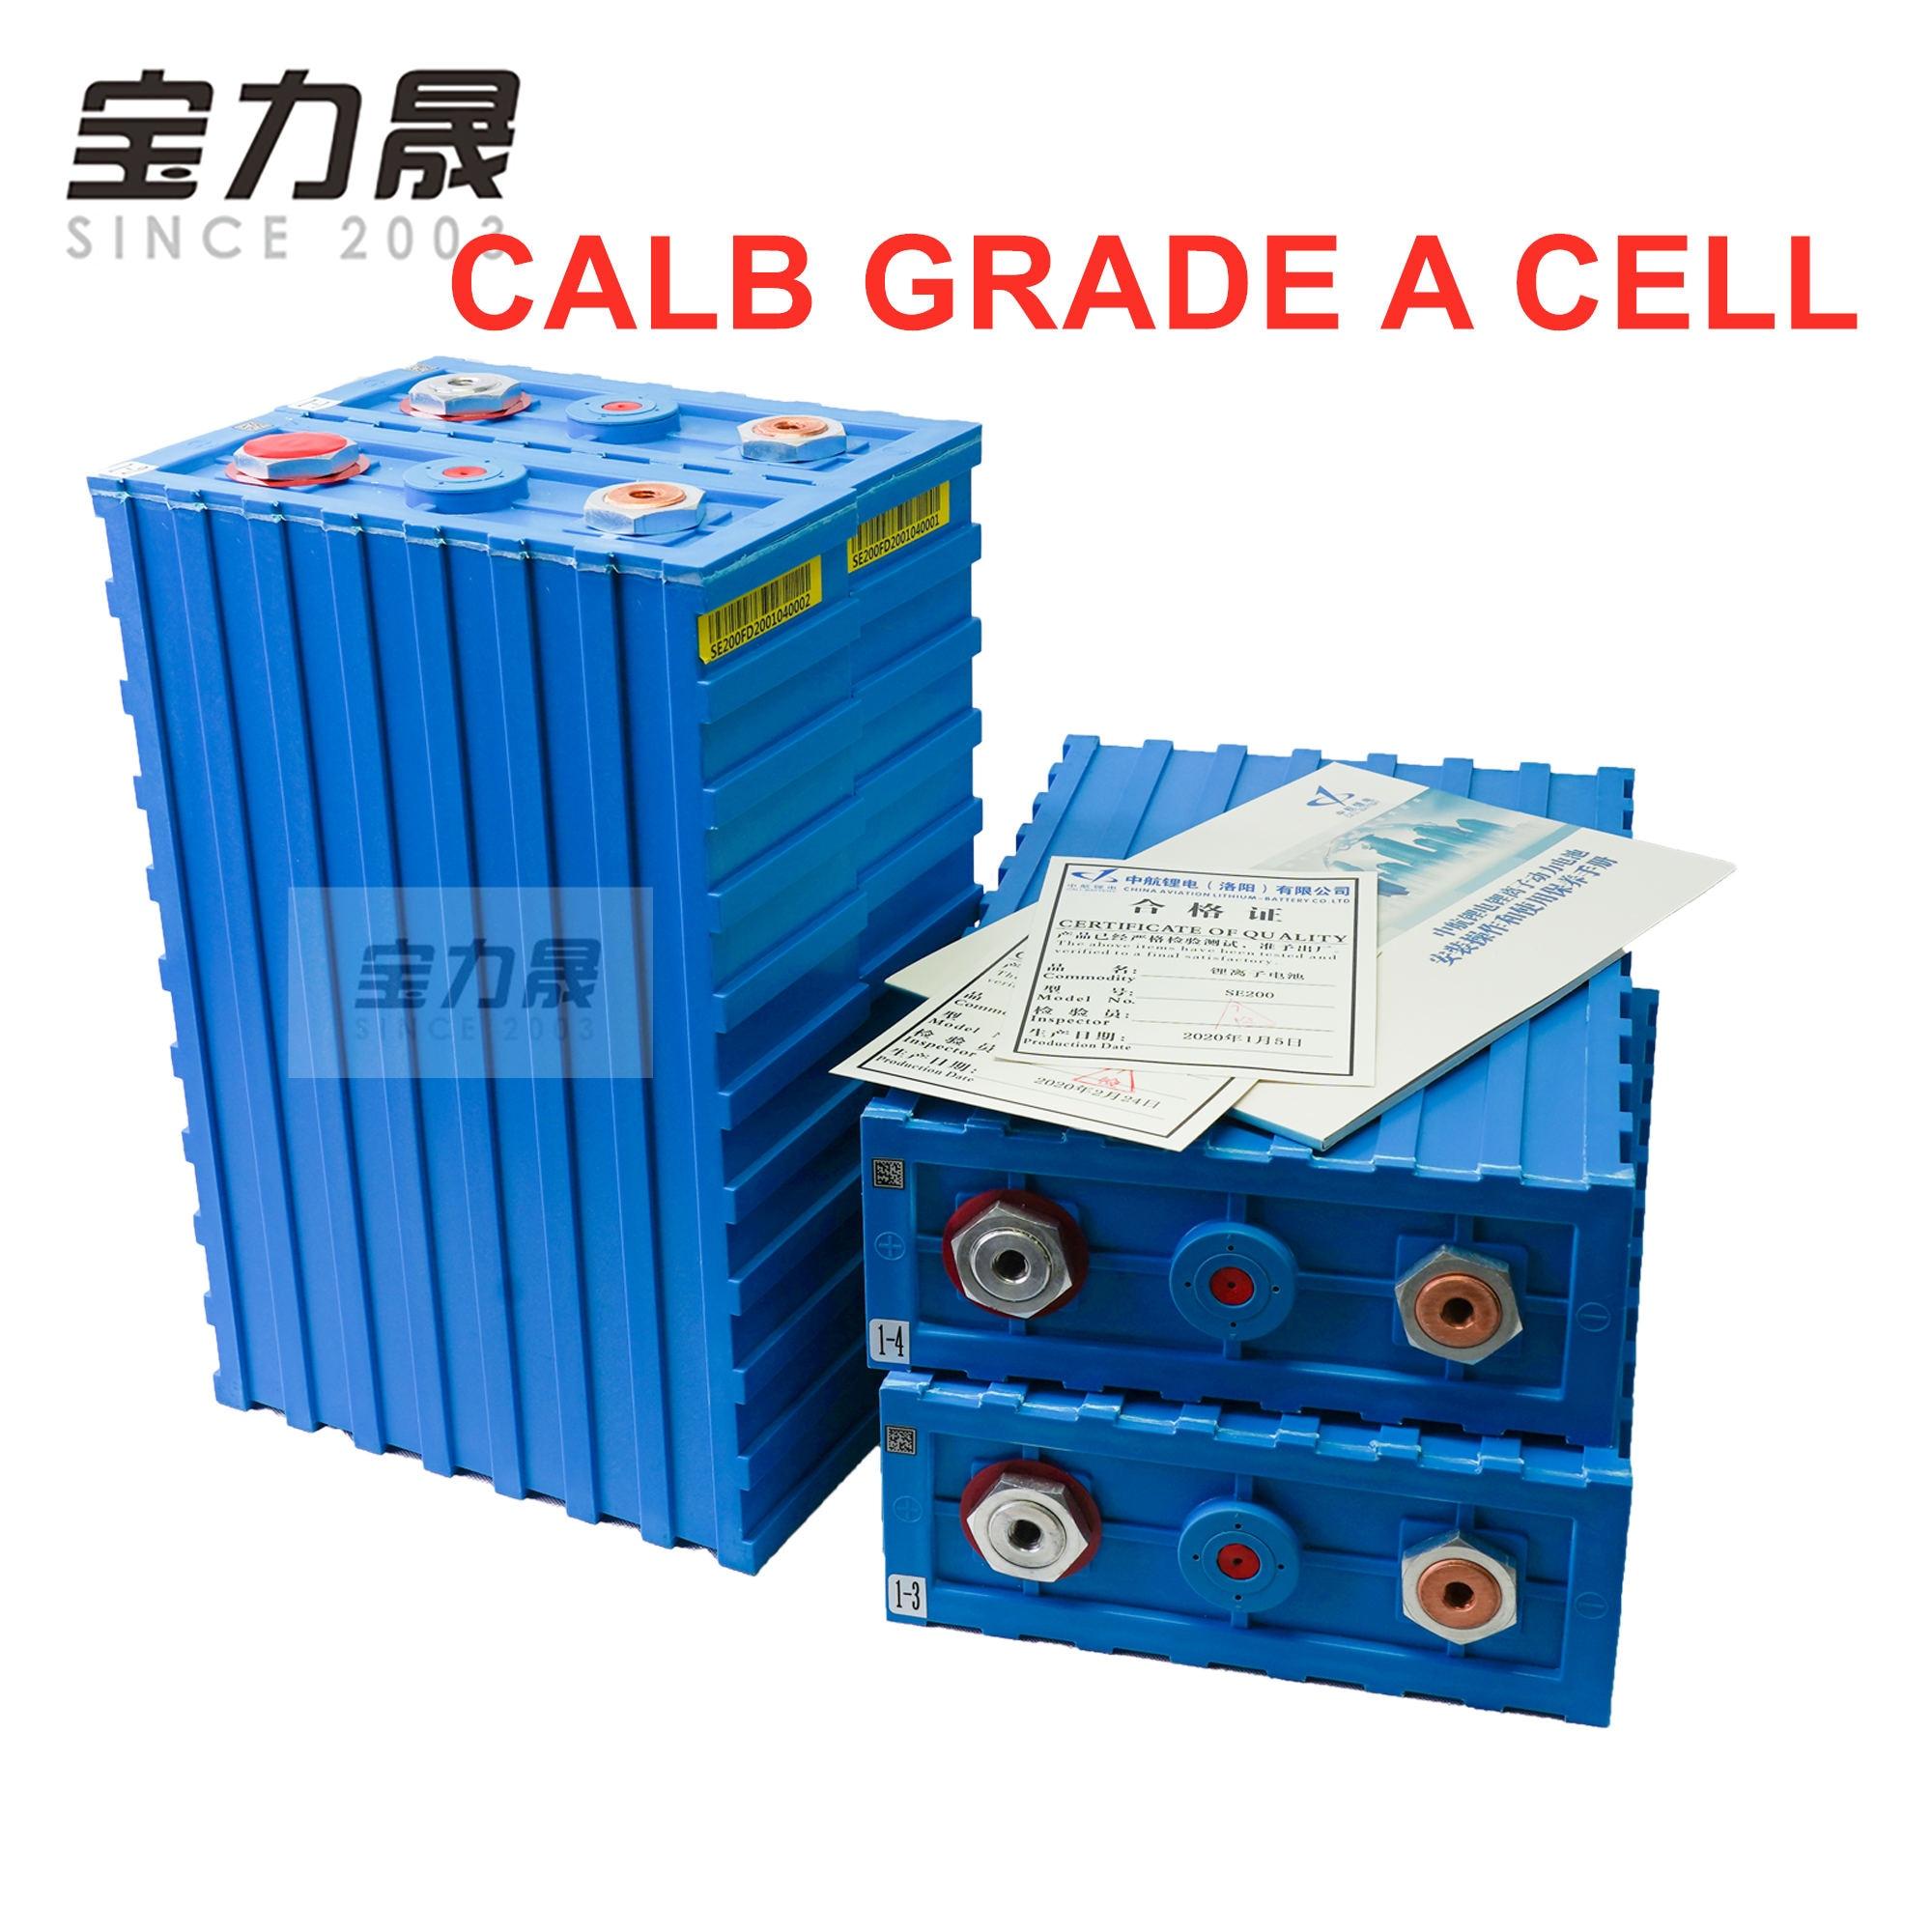 Pilas recargables grado A LiFePO4, celda de 3.2V200ah 2020, nuevo plástico CALB SE200FI 12v24V para pack EV solar US EU AU libre de impuestos